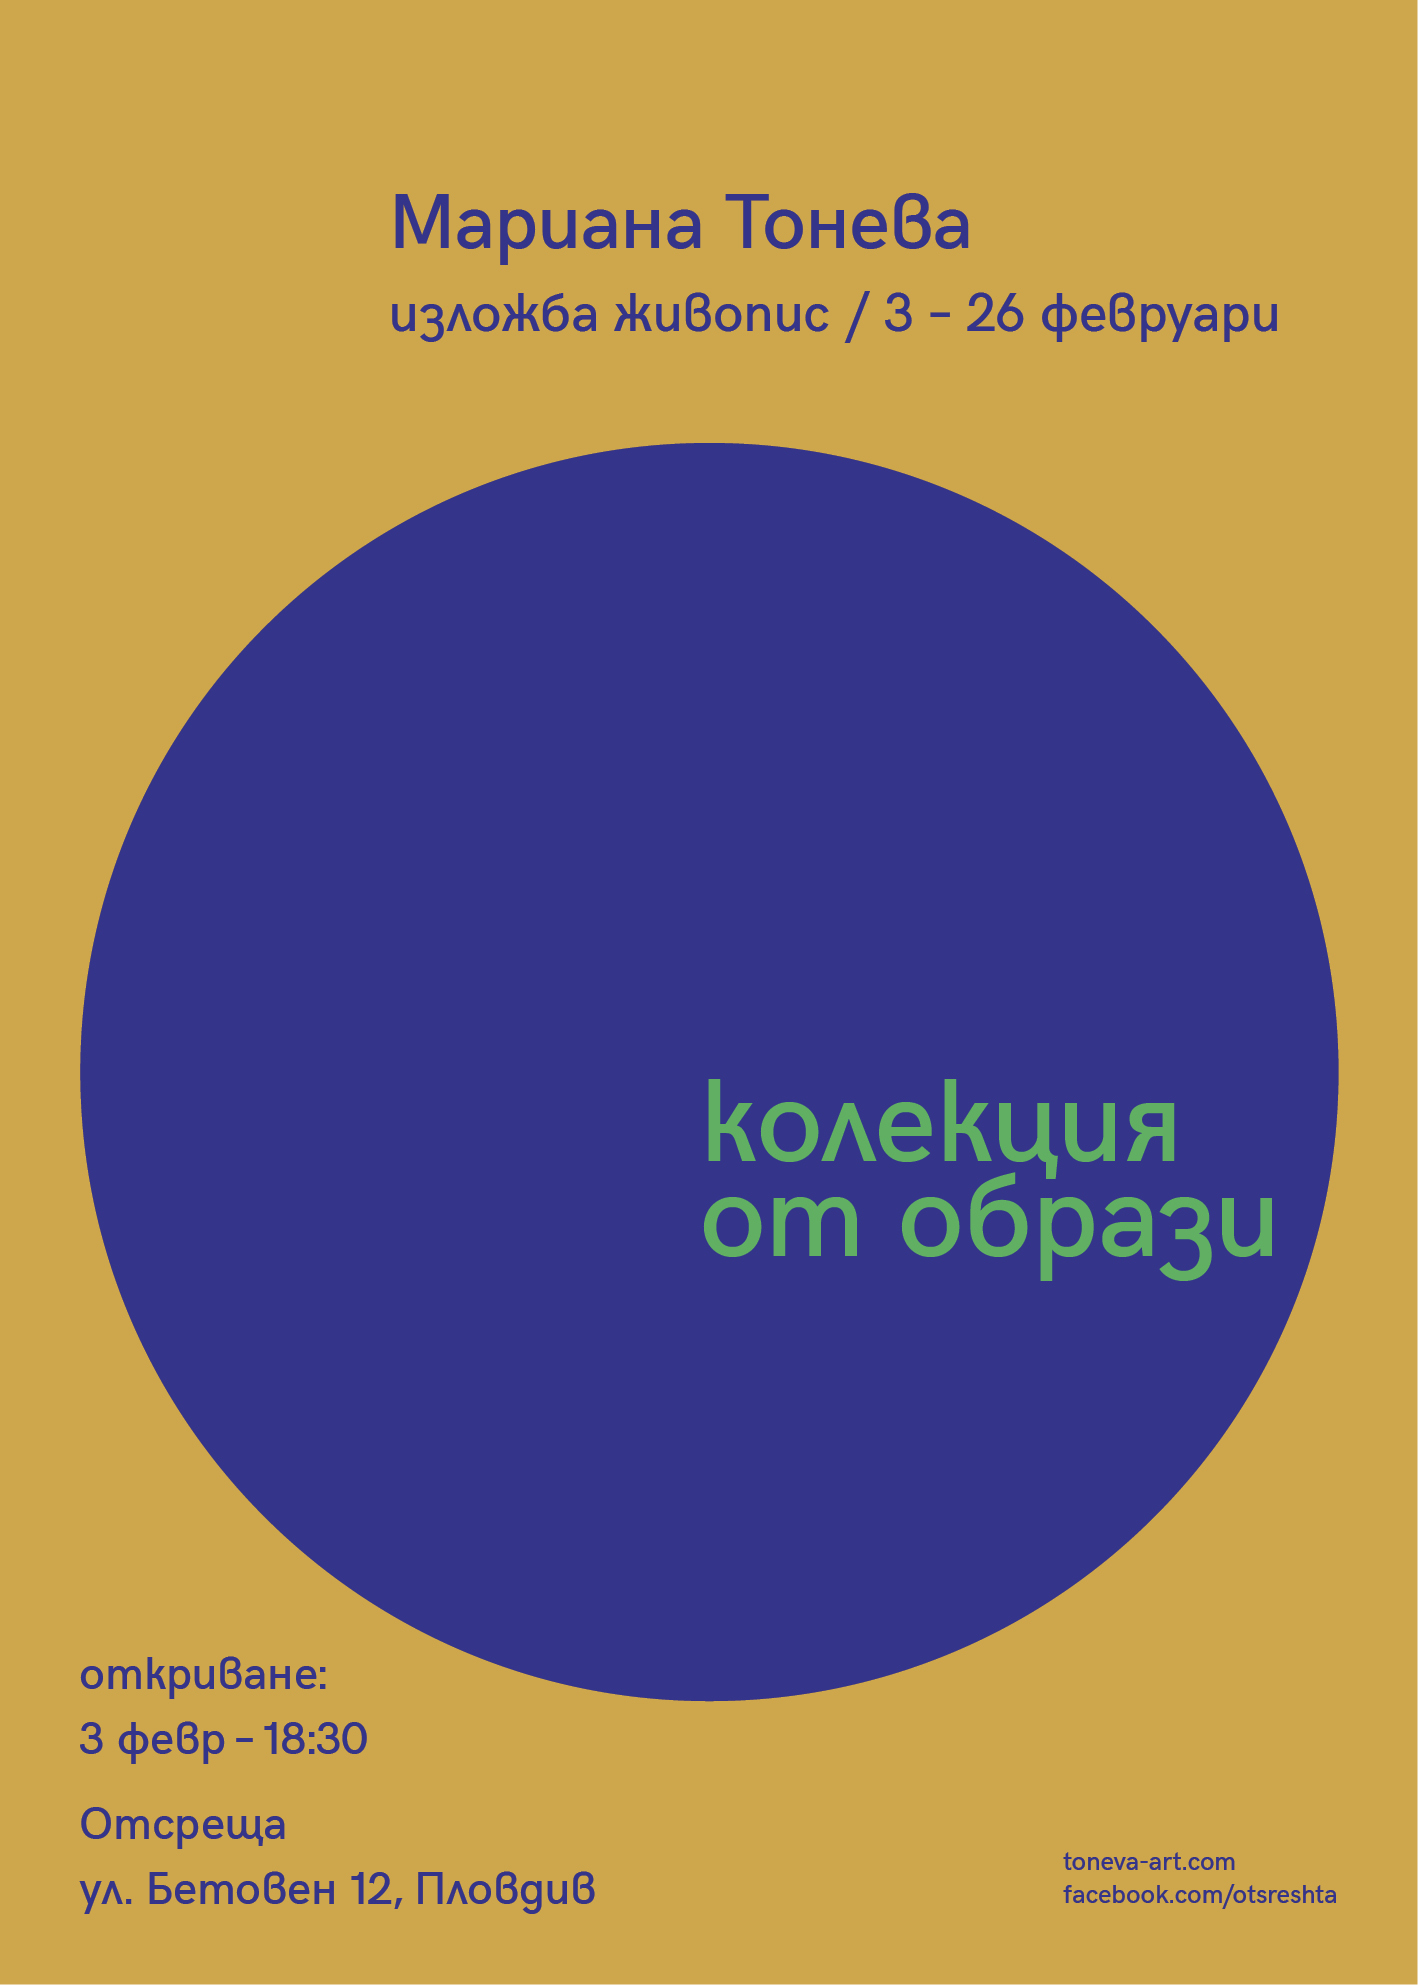 Poster for Mariana Toneva's exhibition A collection of faces